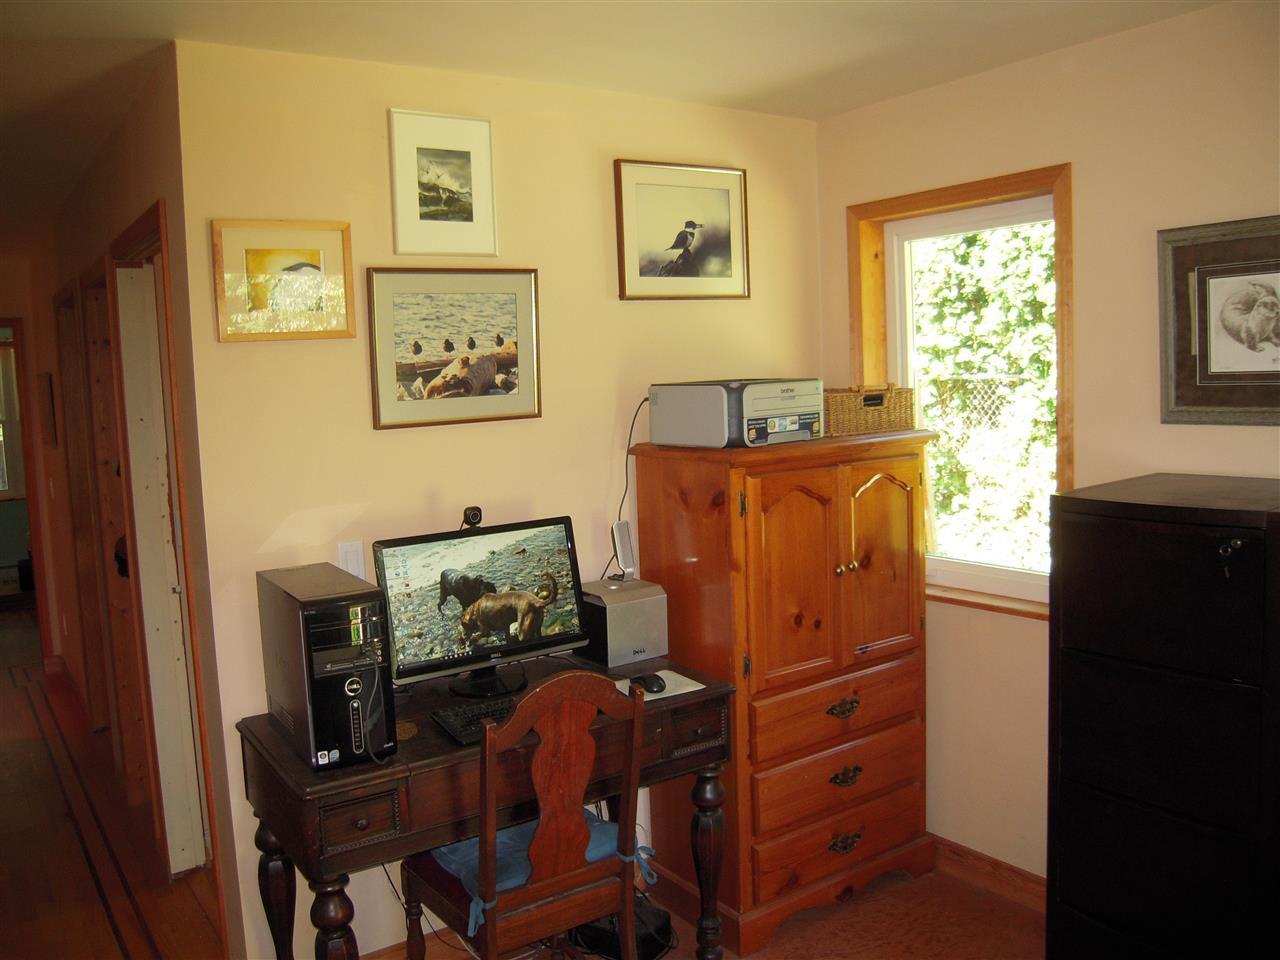 Photo 7: Photos: 2670 LOWER Road: Roberts Creek House for sale (Sunshine Coast)  : MLS®# R2096275